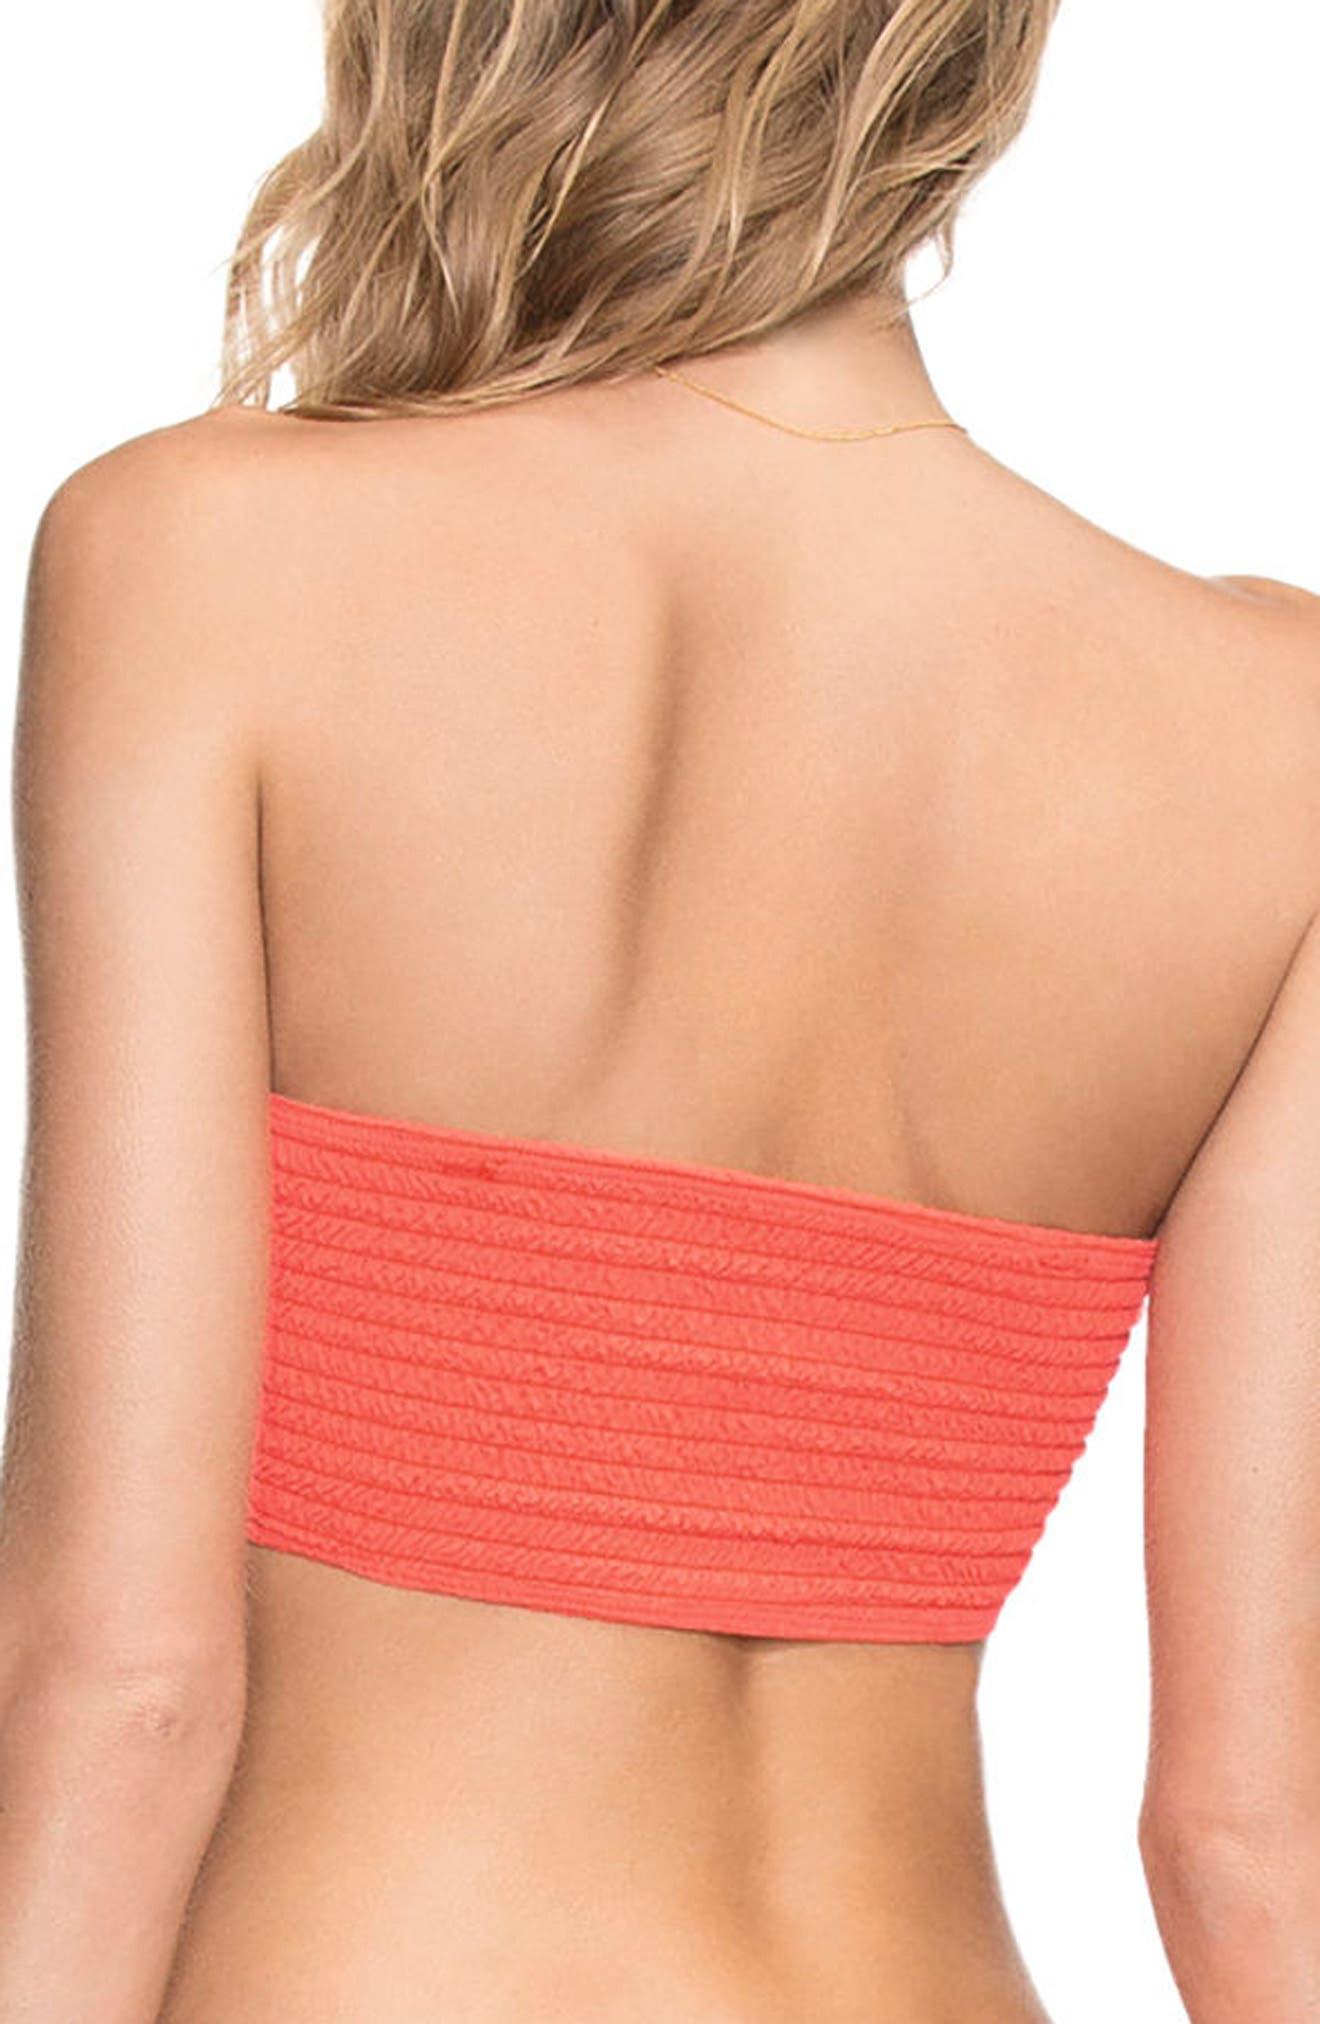 Dahlia Four Way Reversible Bandeau Bikini Top,                             Alternate thumbnail 2, color,                             Dahlia